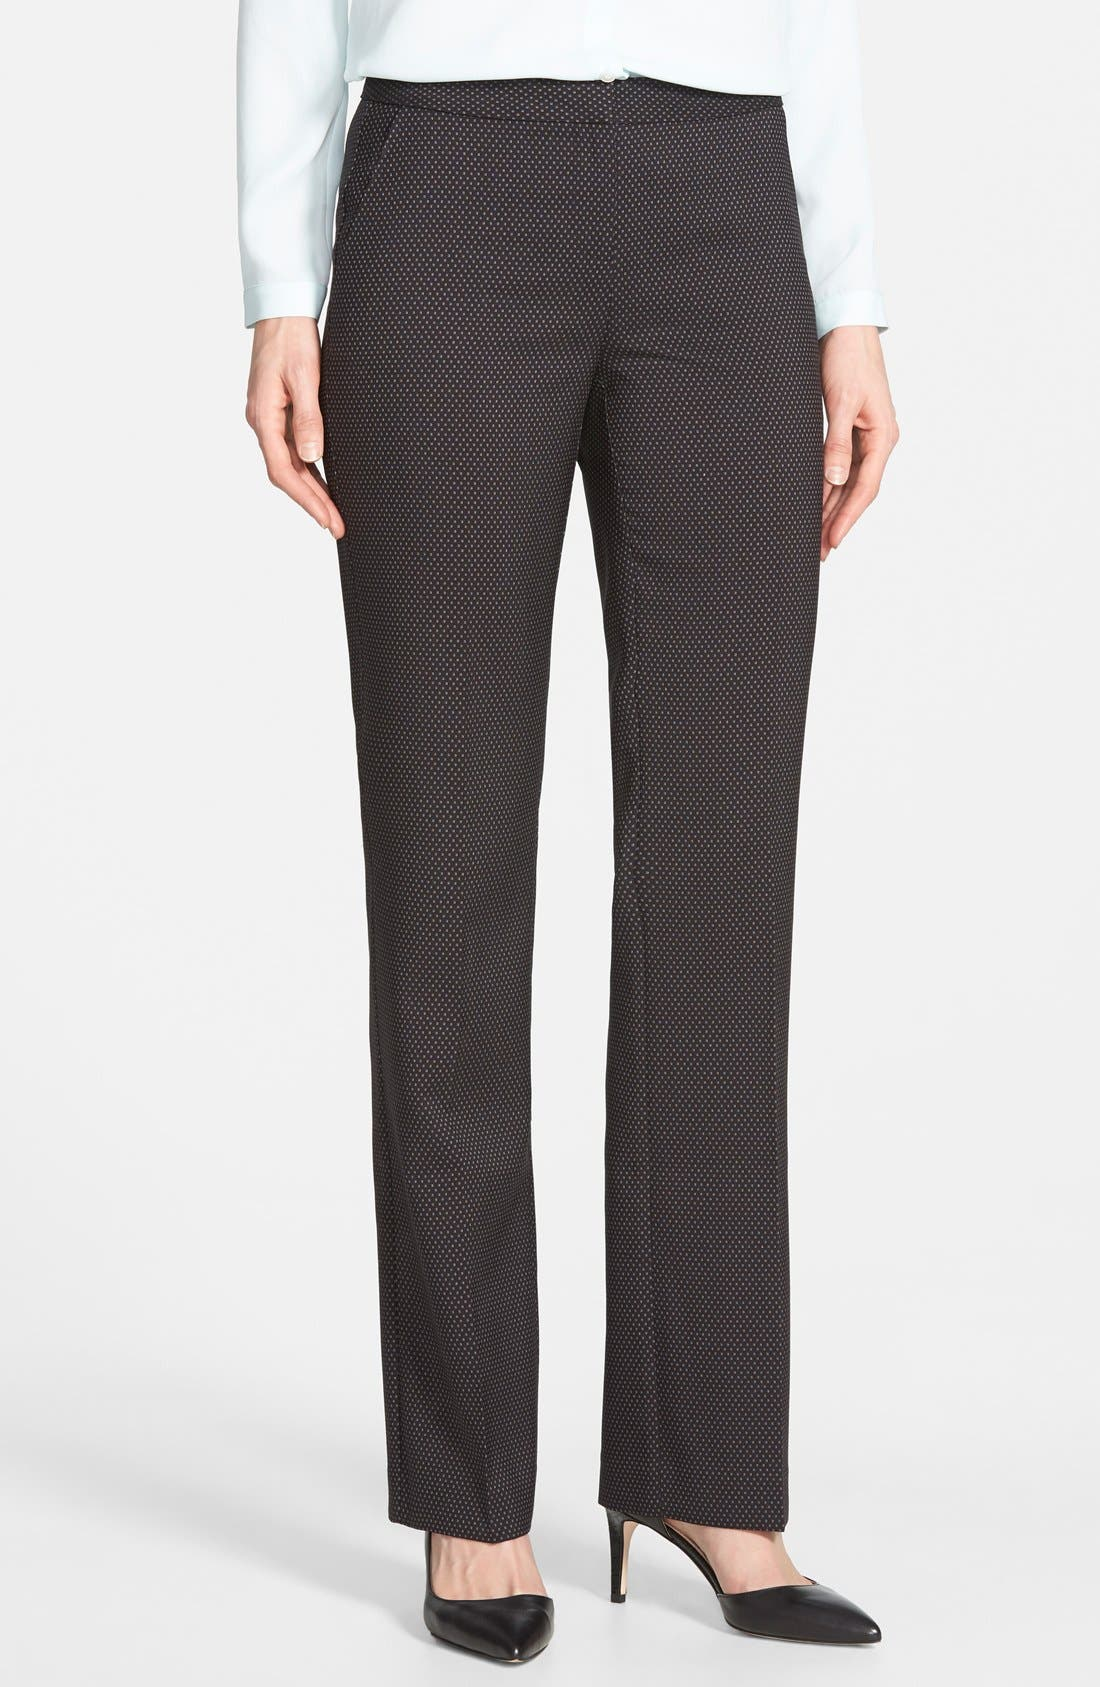 Alternate Image 1 Selected - Halogen® 'Taylor' Darling Dot Suit Pants (Regular & Petite)